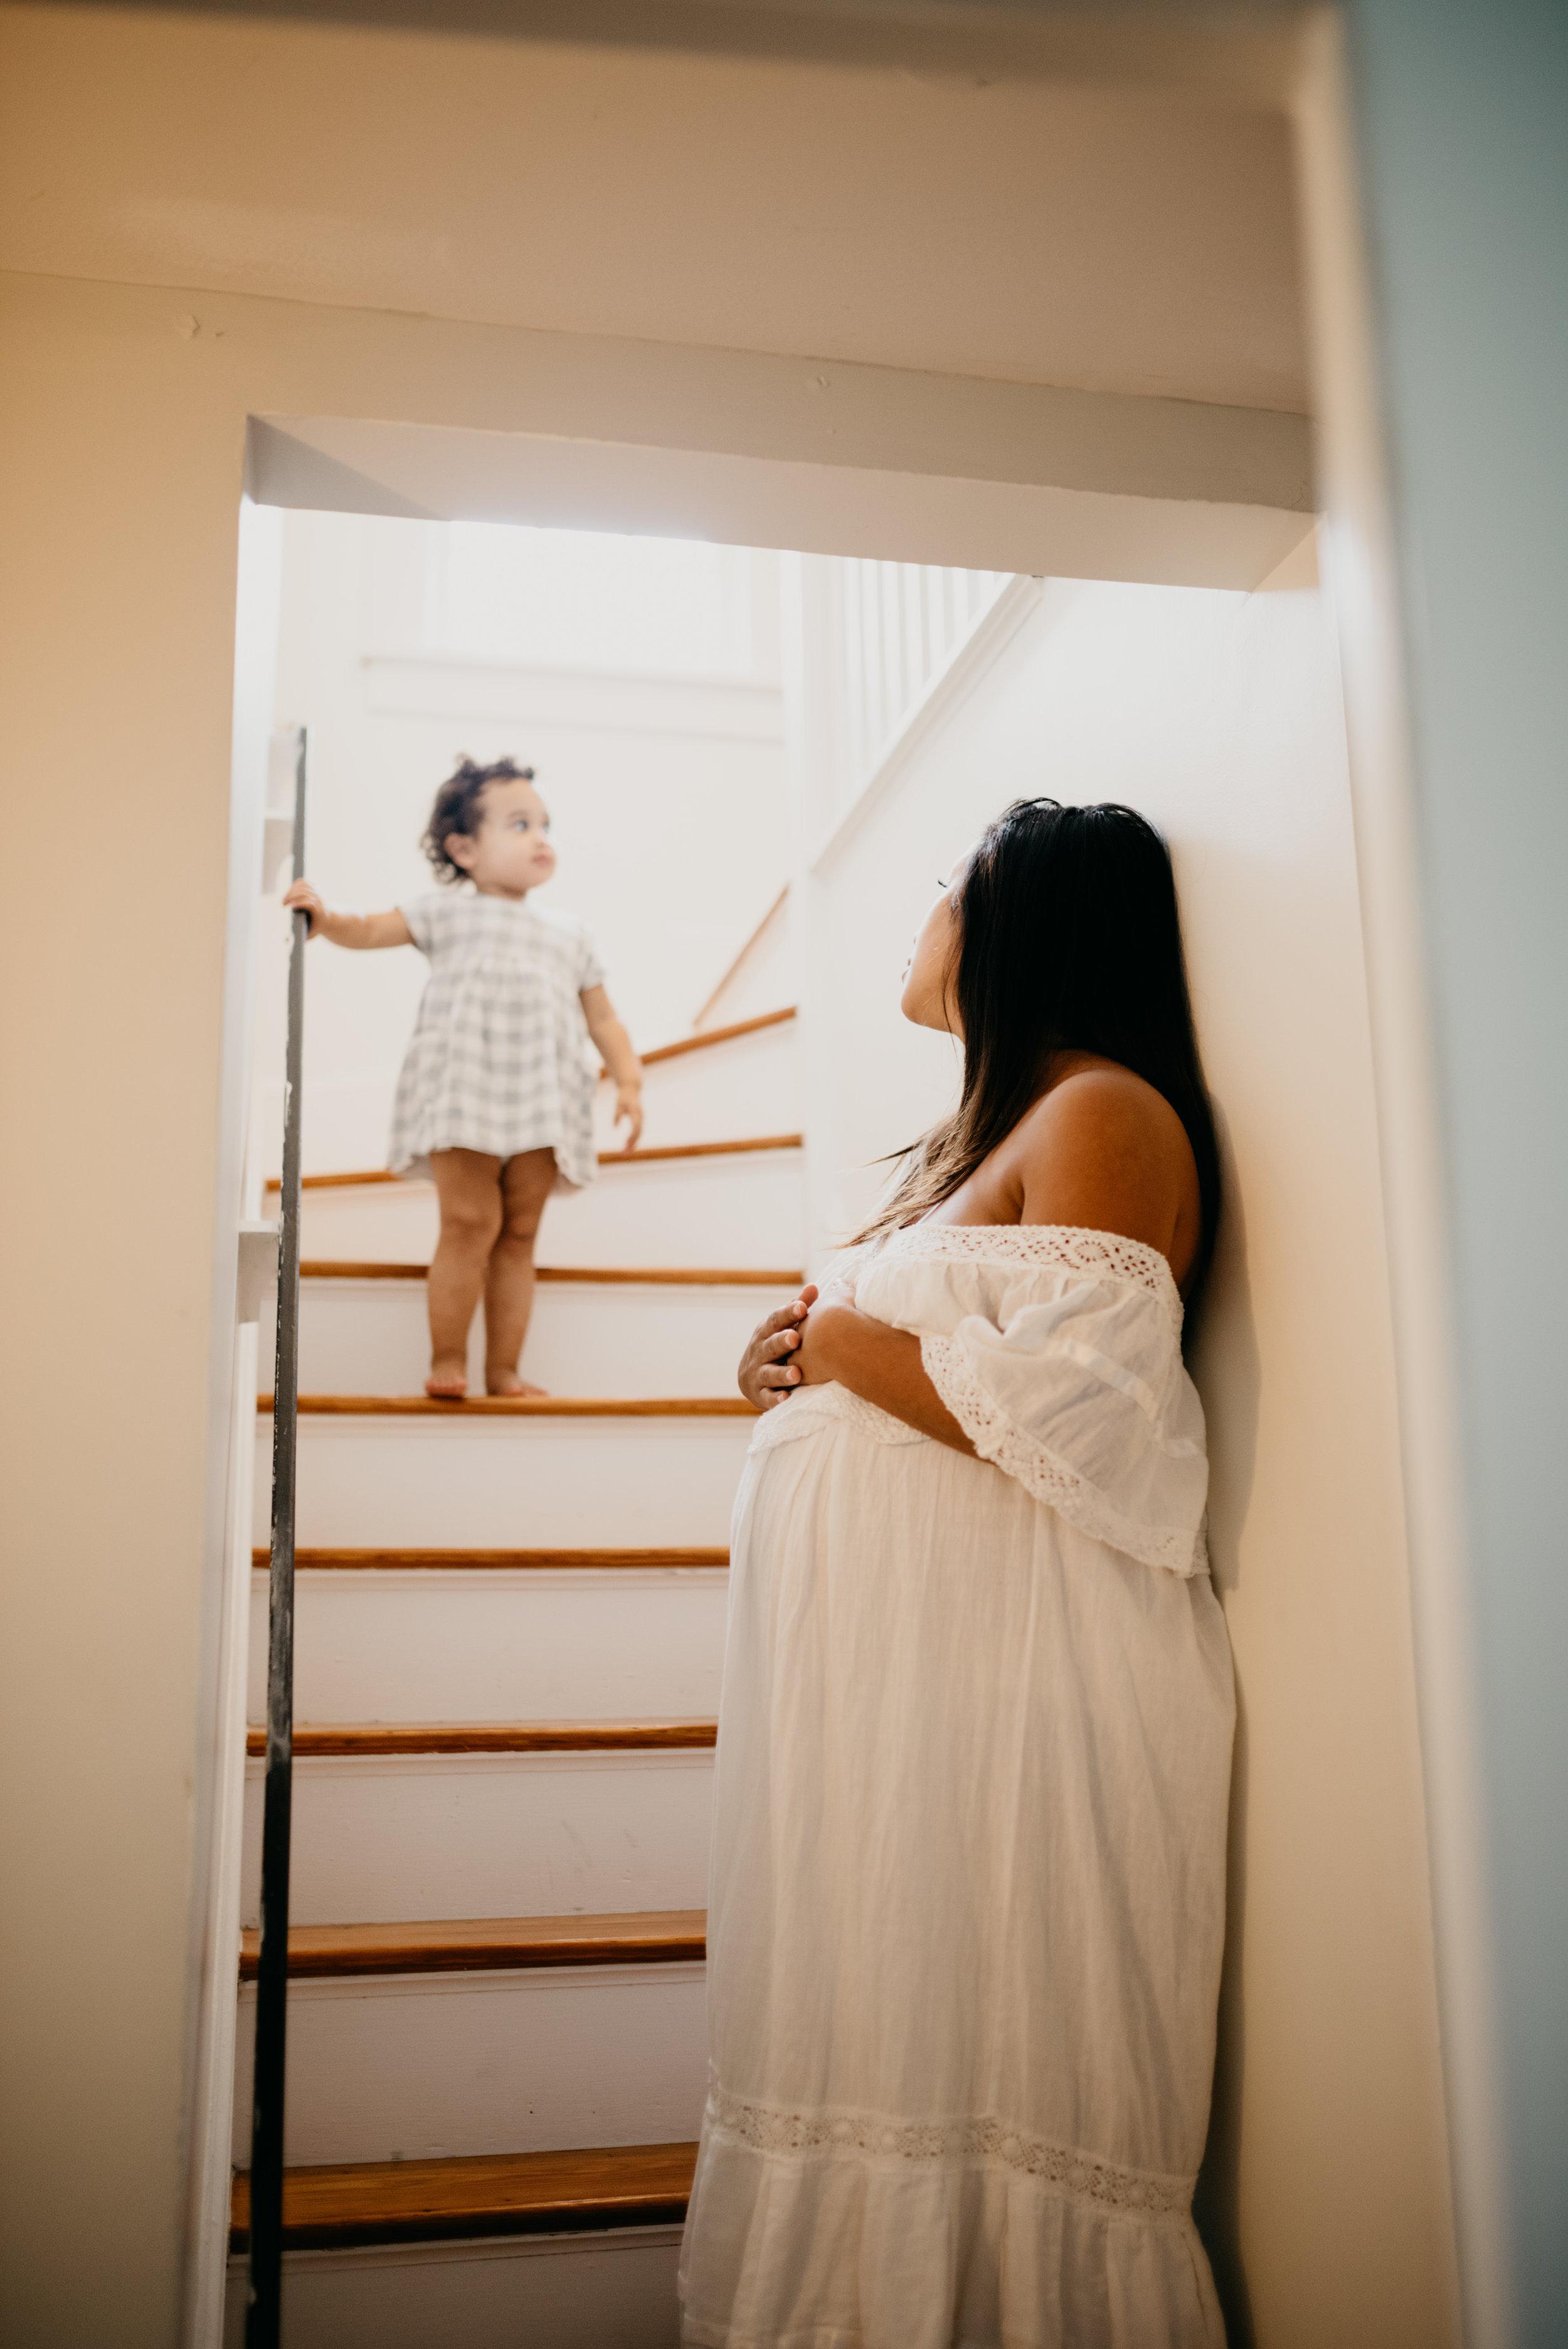 Ehrman-Massachusetts-In Home Lifestyle Maternity Session-Documentary Family Photographer-336.jpg